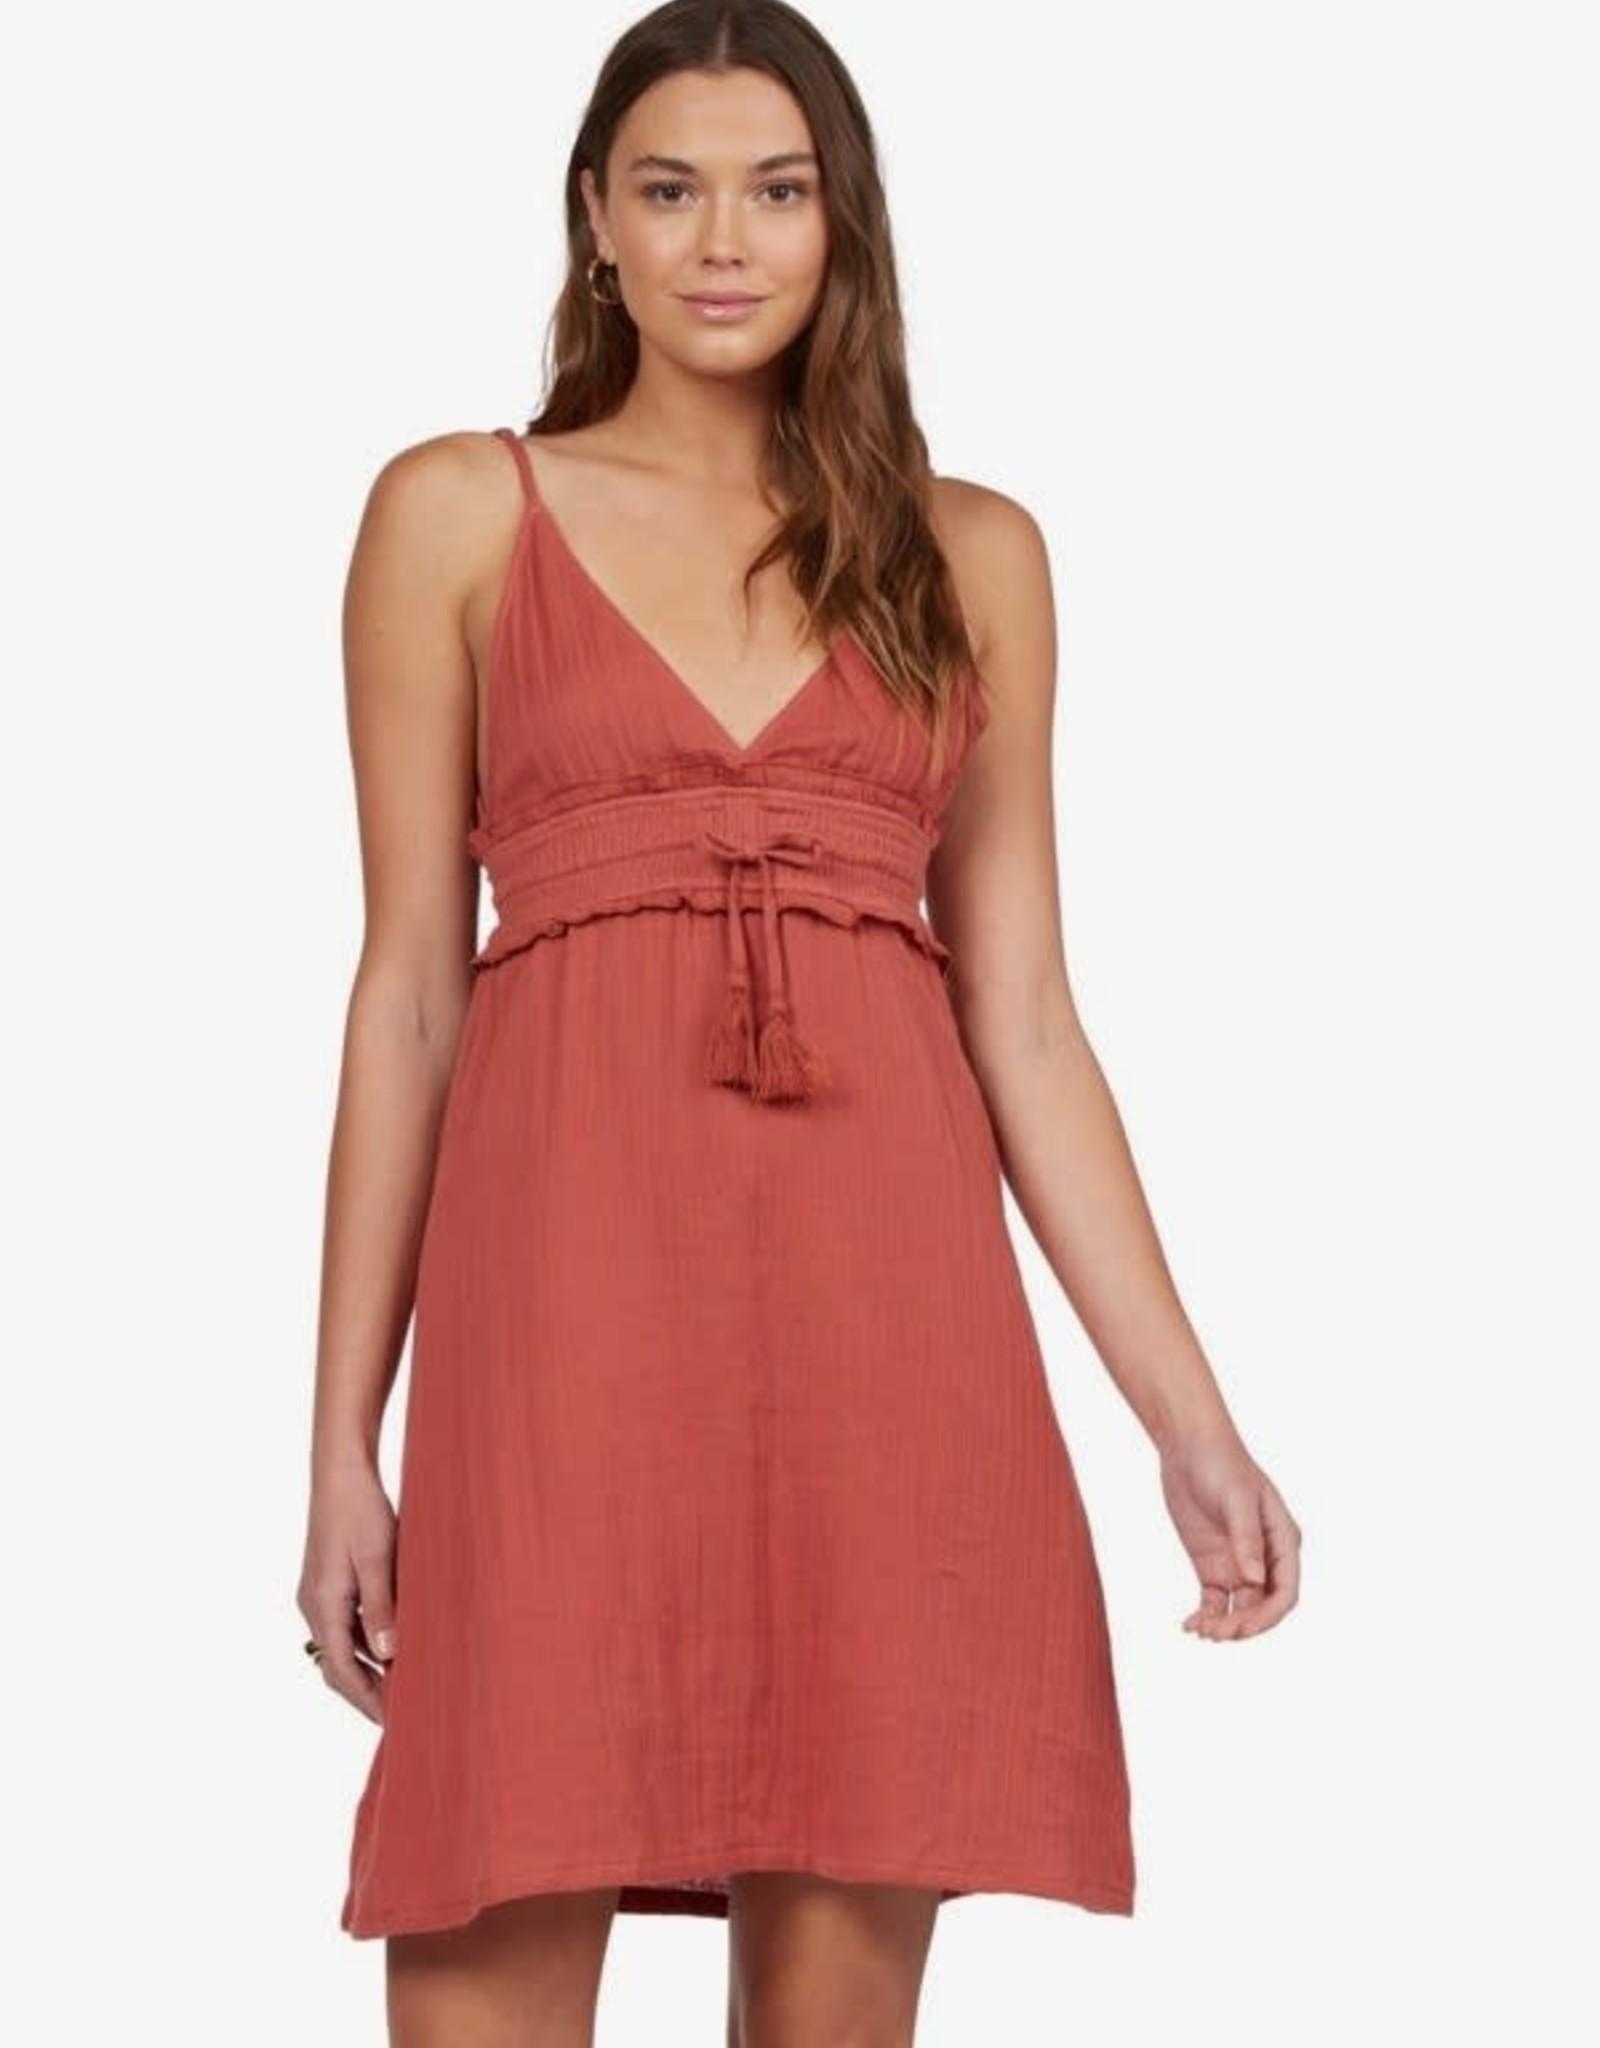 Roxy Roxy Simple Blossom Dress ARJWD03391